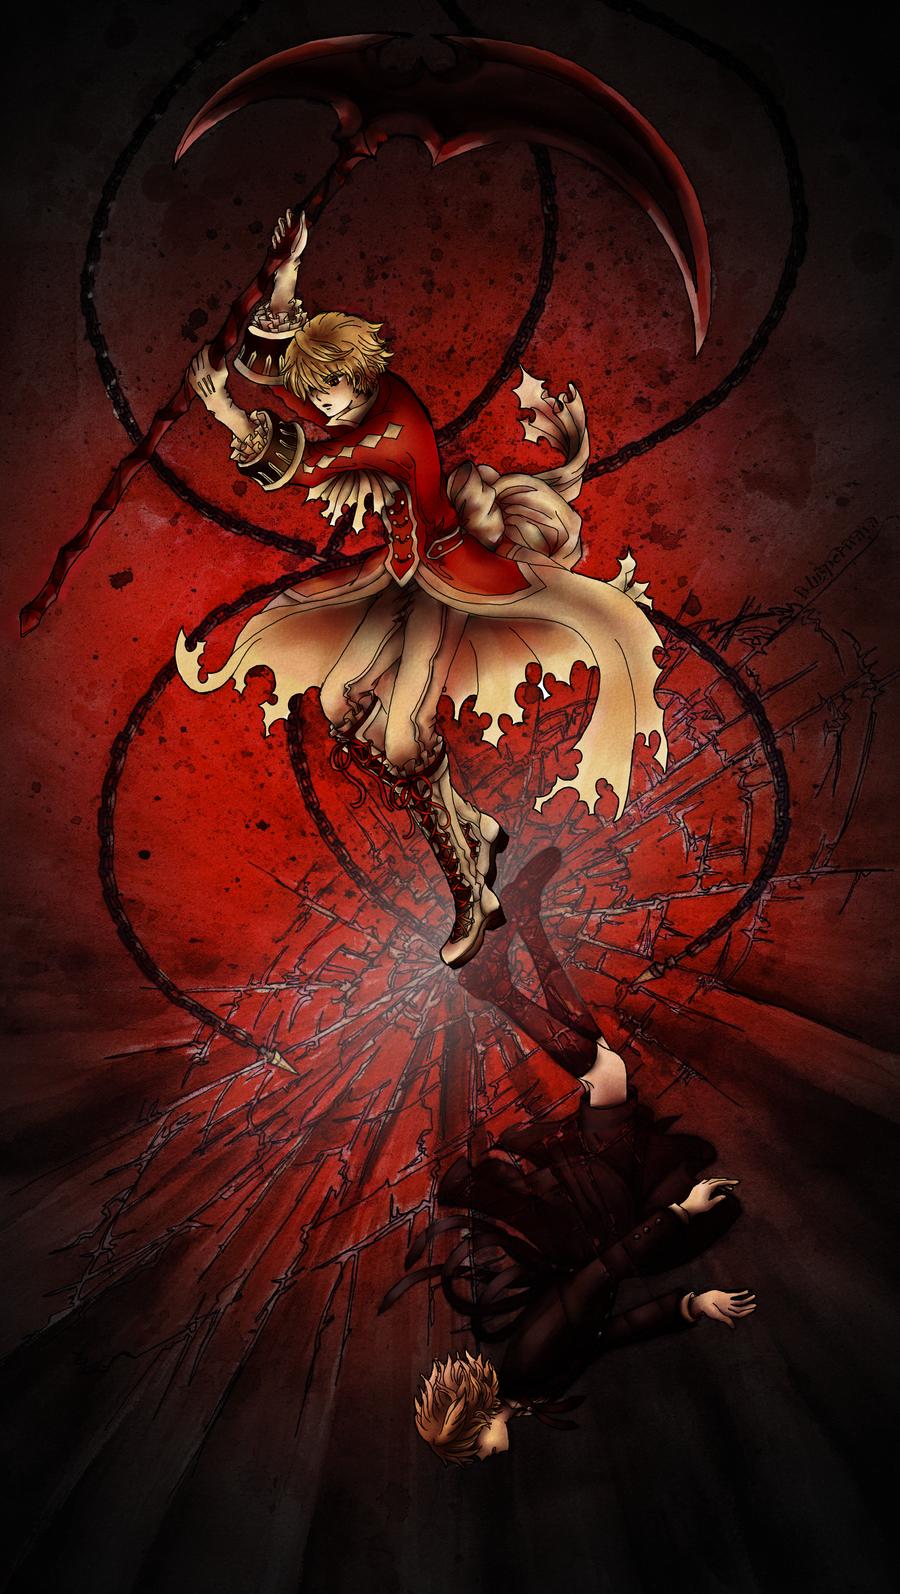 Bloodstained Black Rabbit by WhisperWaya